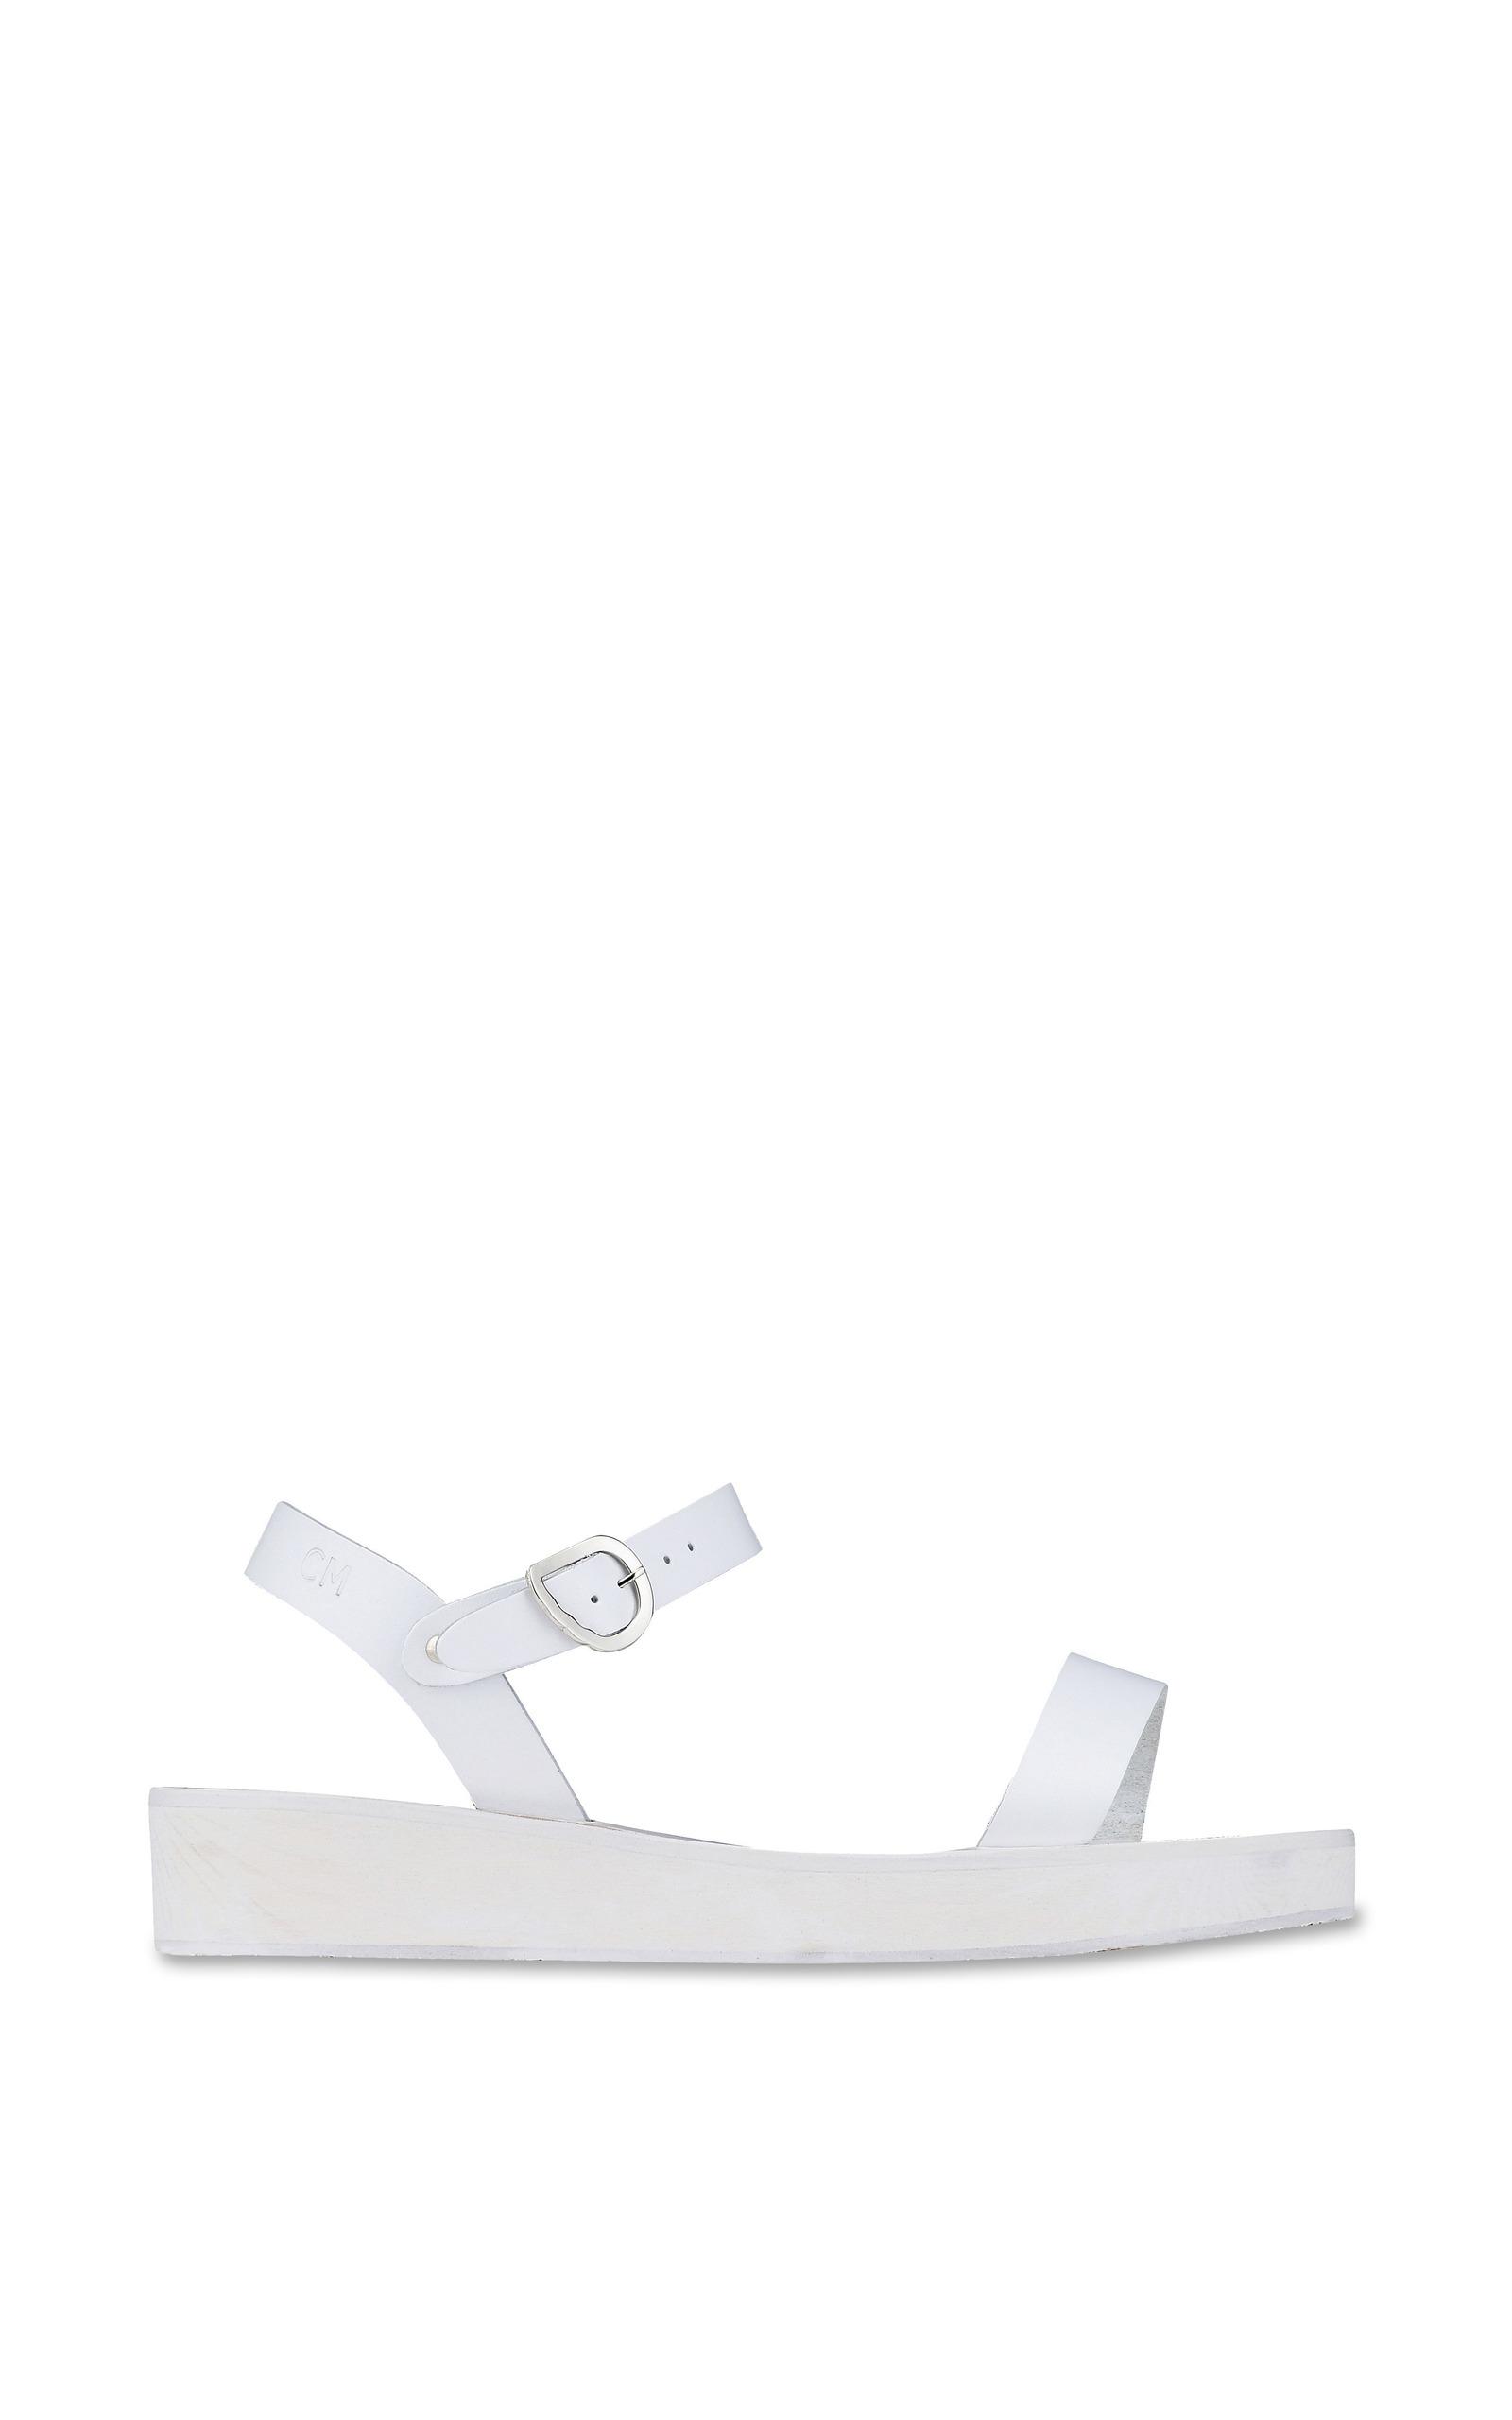 a6295406bd Ancient Greek SandalsDrama Platform Sandal In All White. CLOSE. Loading